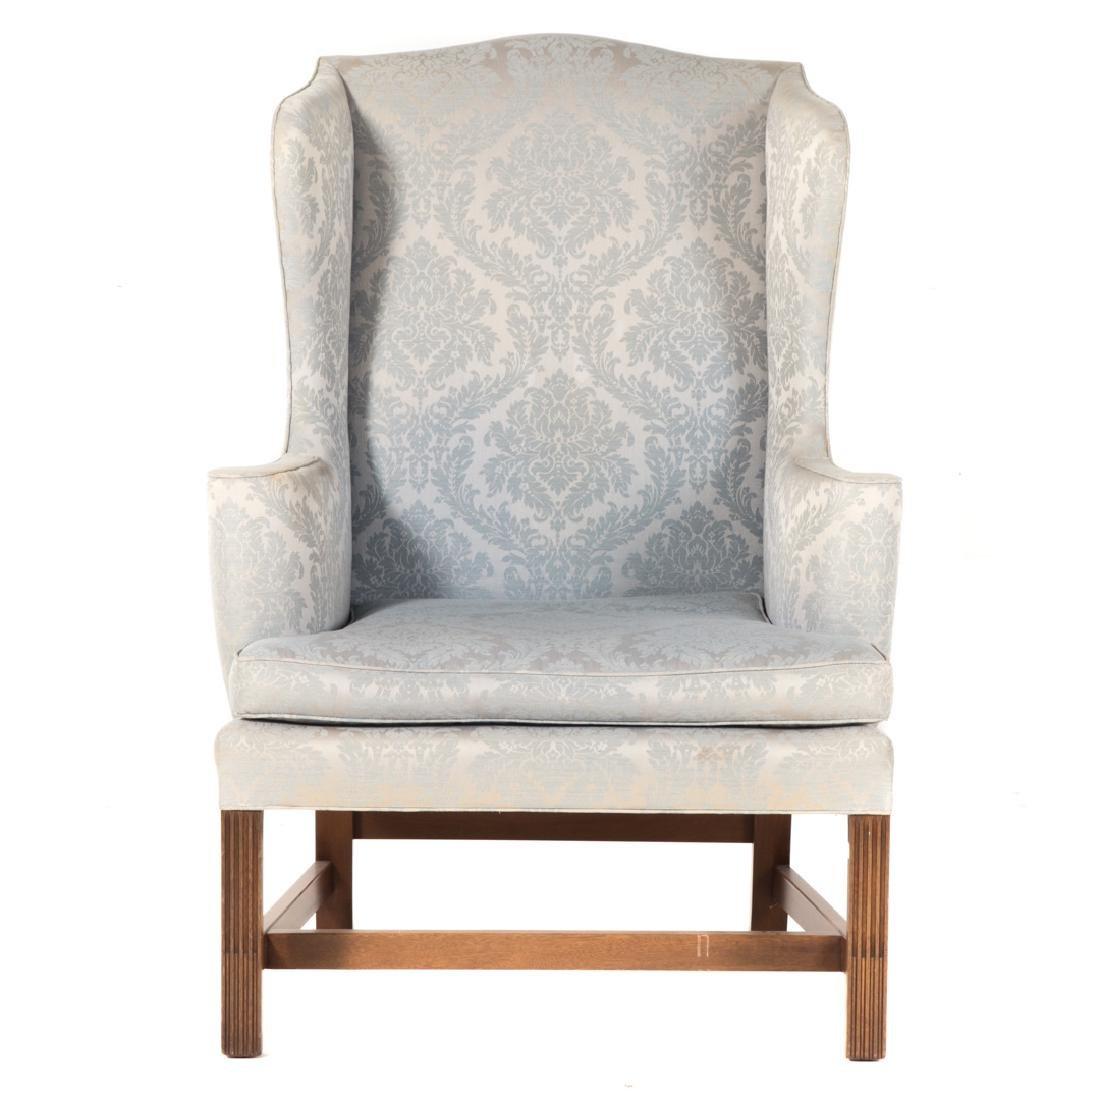 Kittinger George III style mahogany wing chair